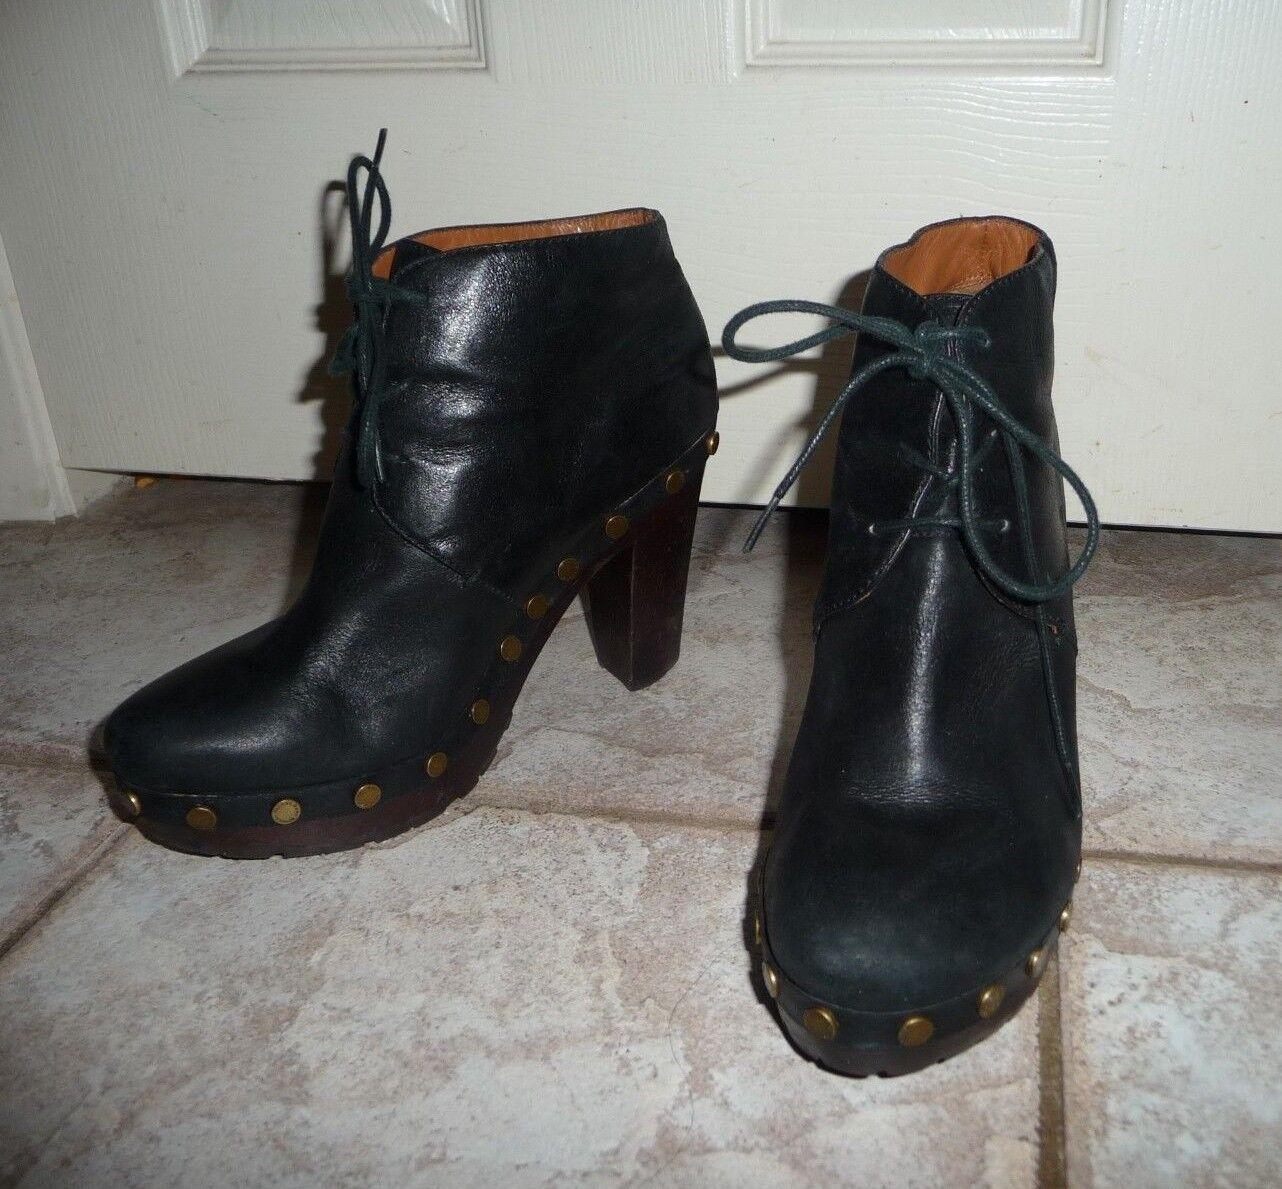 Marc Jacobs Black Lace Up Clogs US Size 7.5 Stacked Heel, 4″ Platform 1